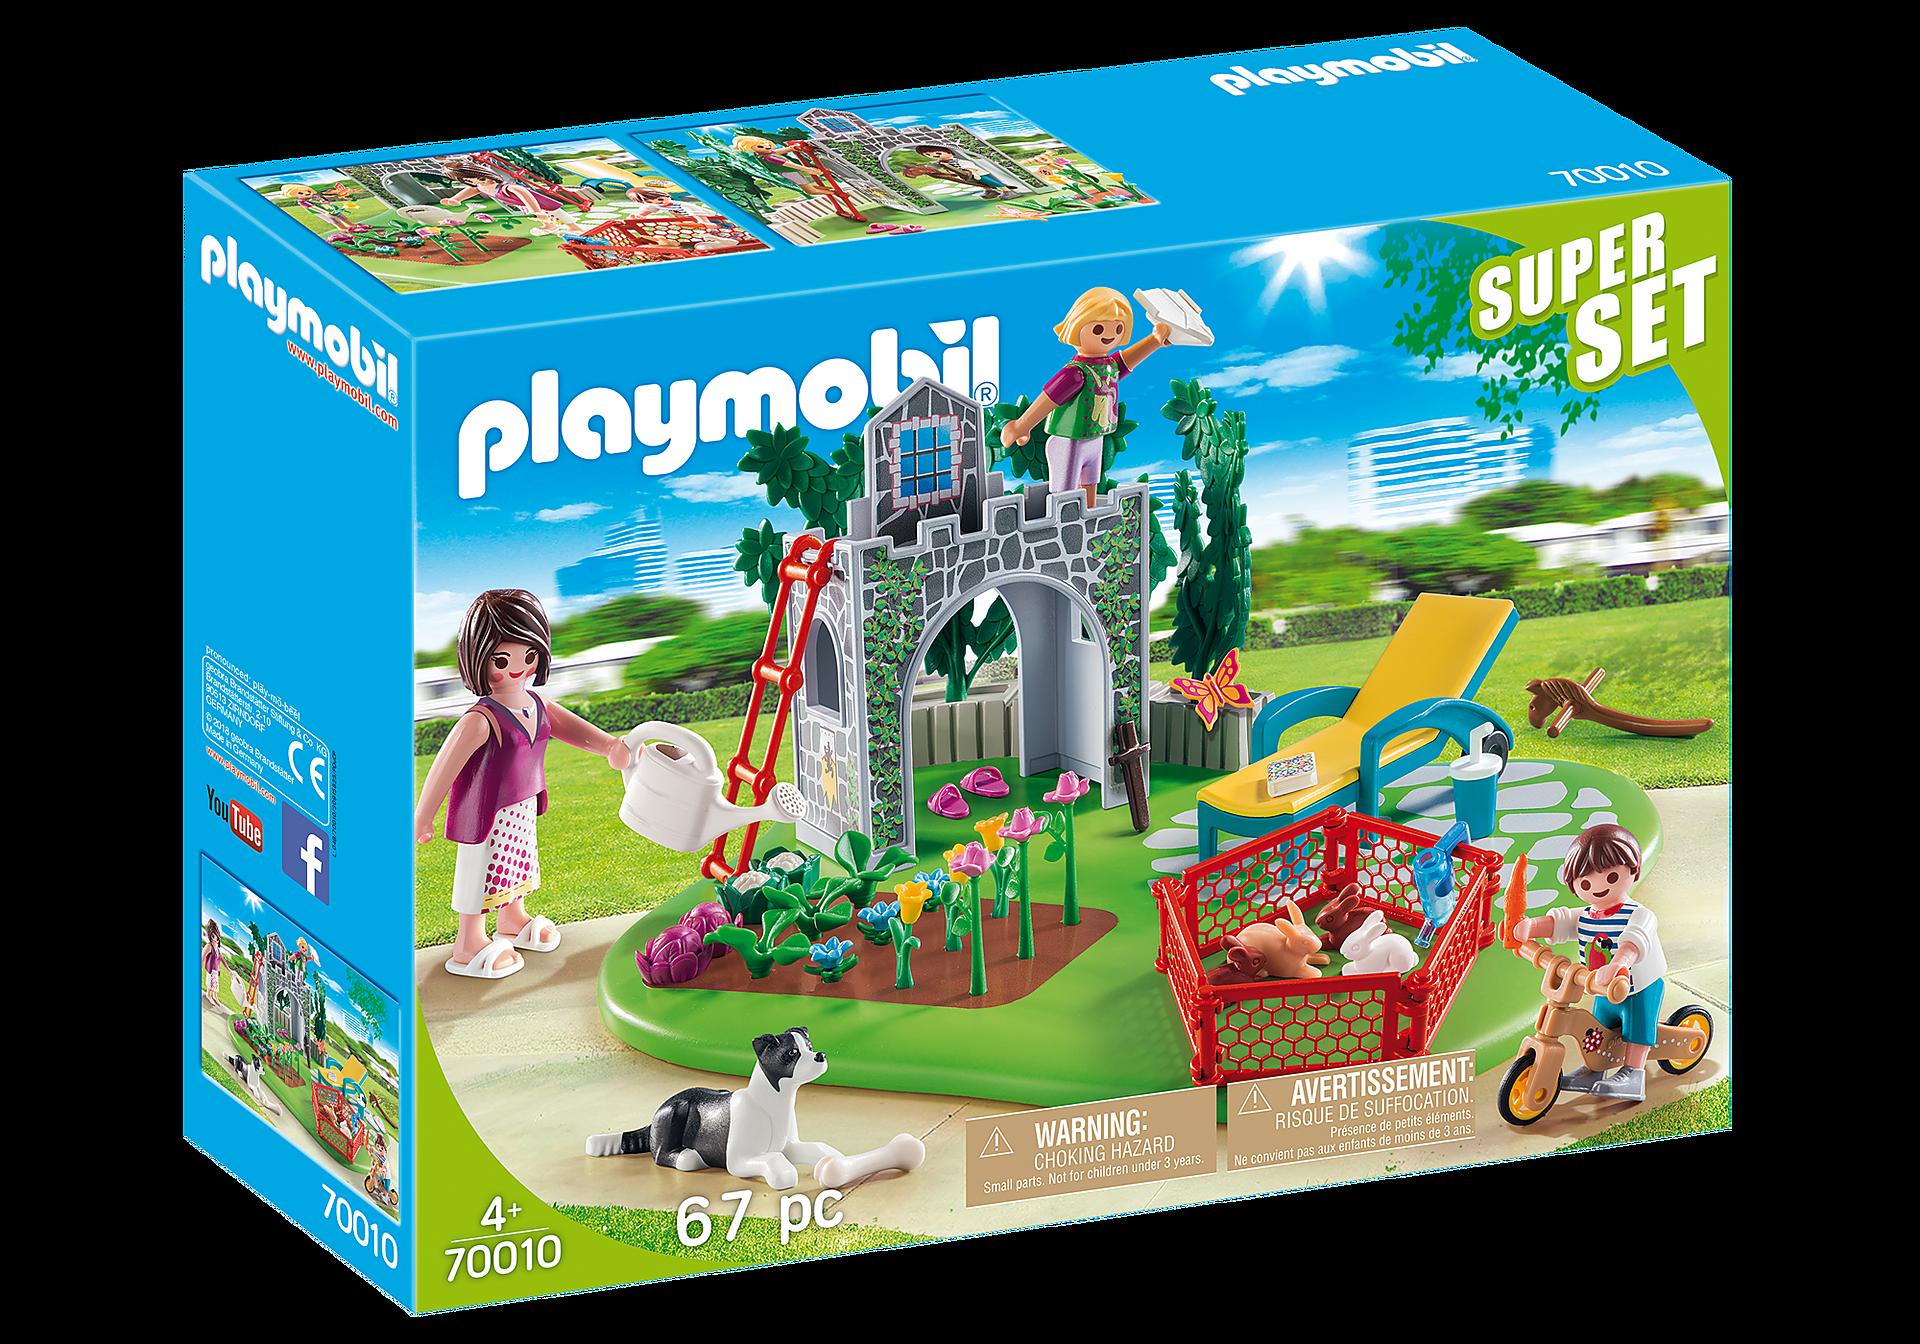 http://media.playmobil.com/i/playmobil/70010_product_box_front/SuperSet Famille et jardin